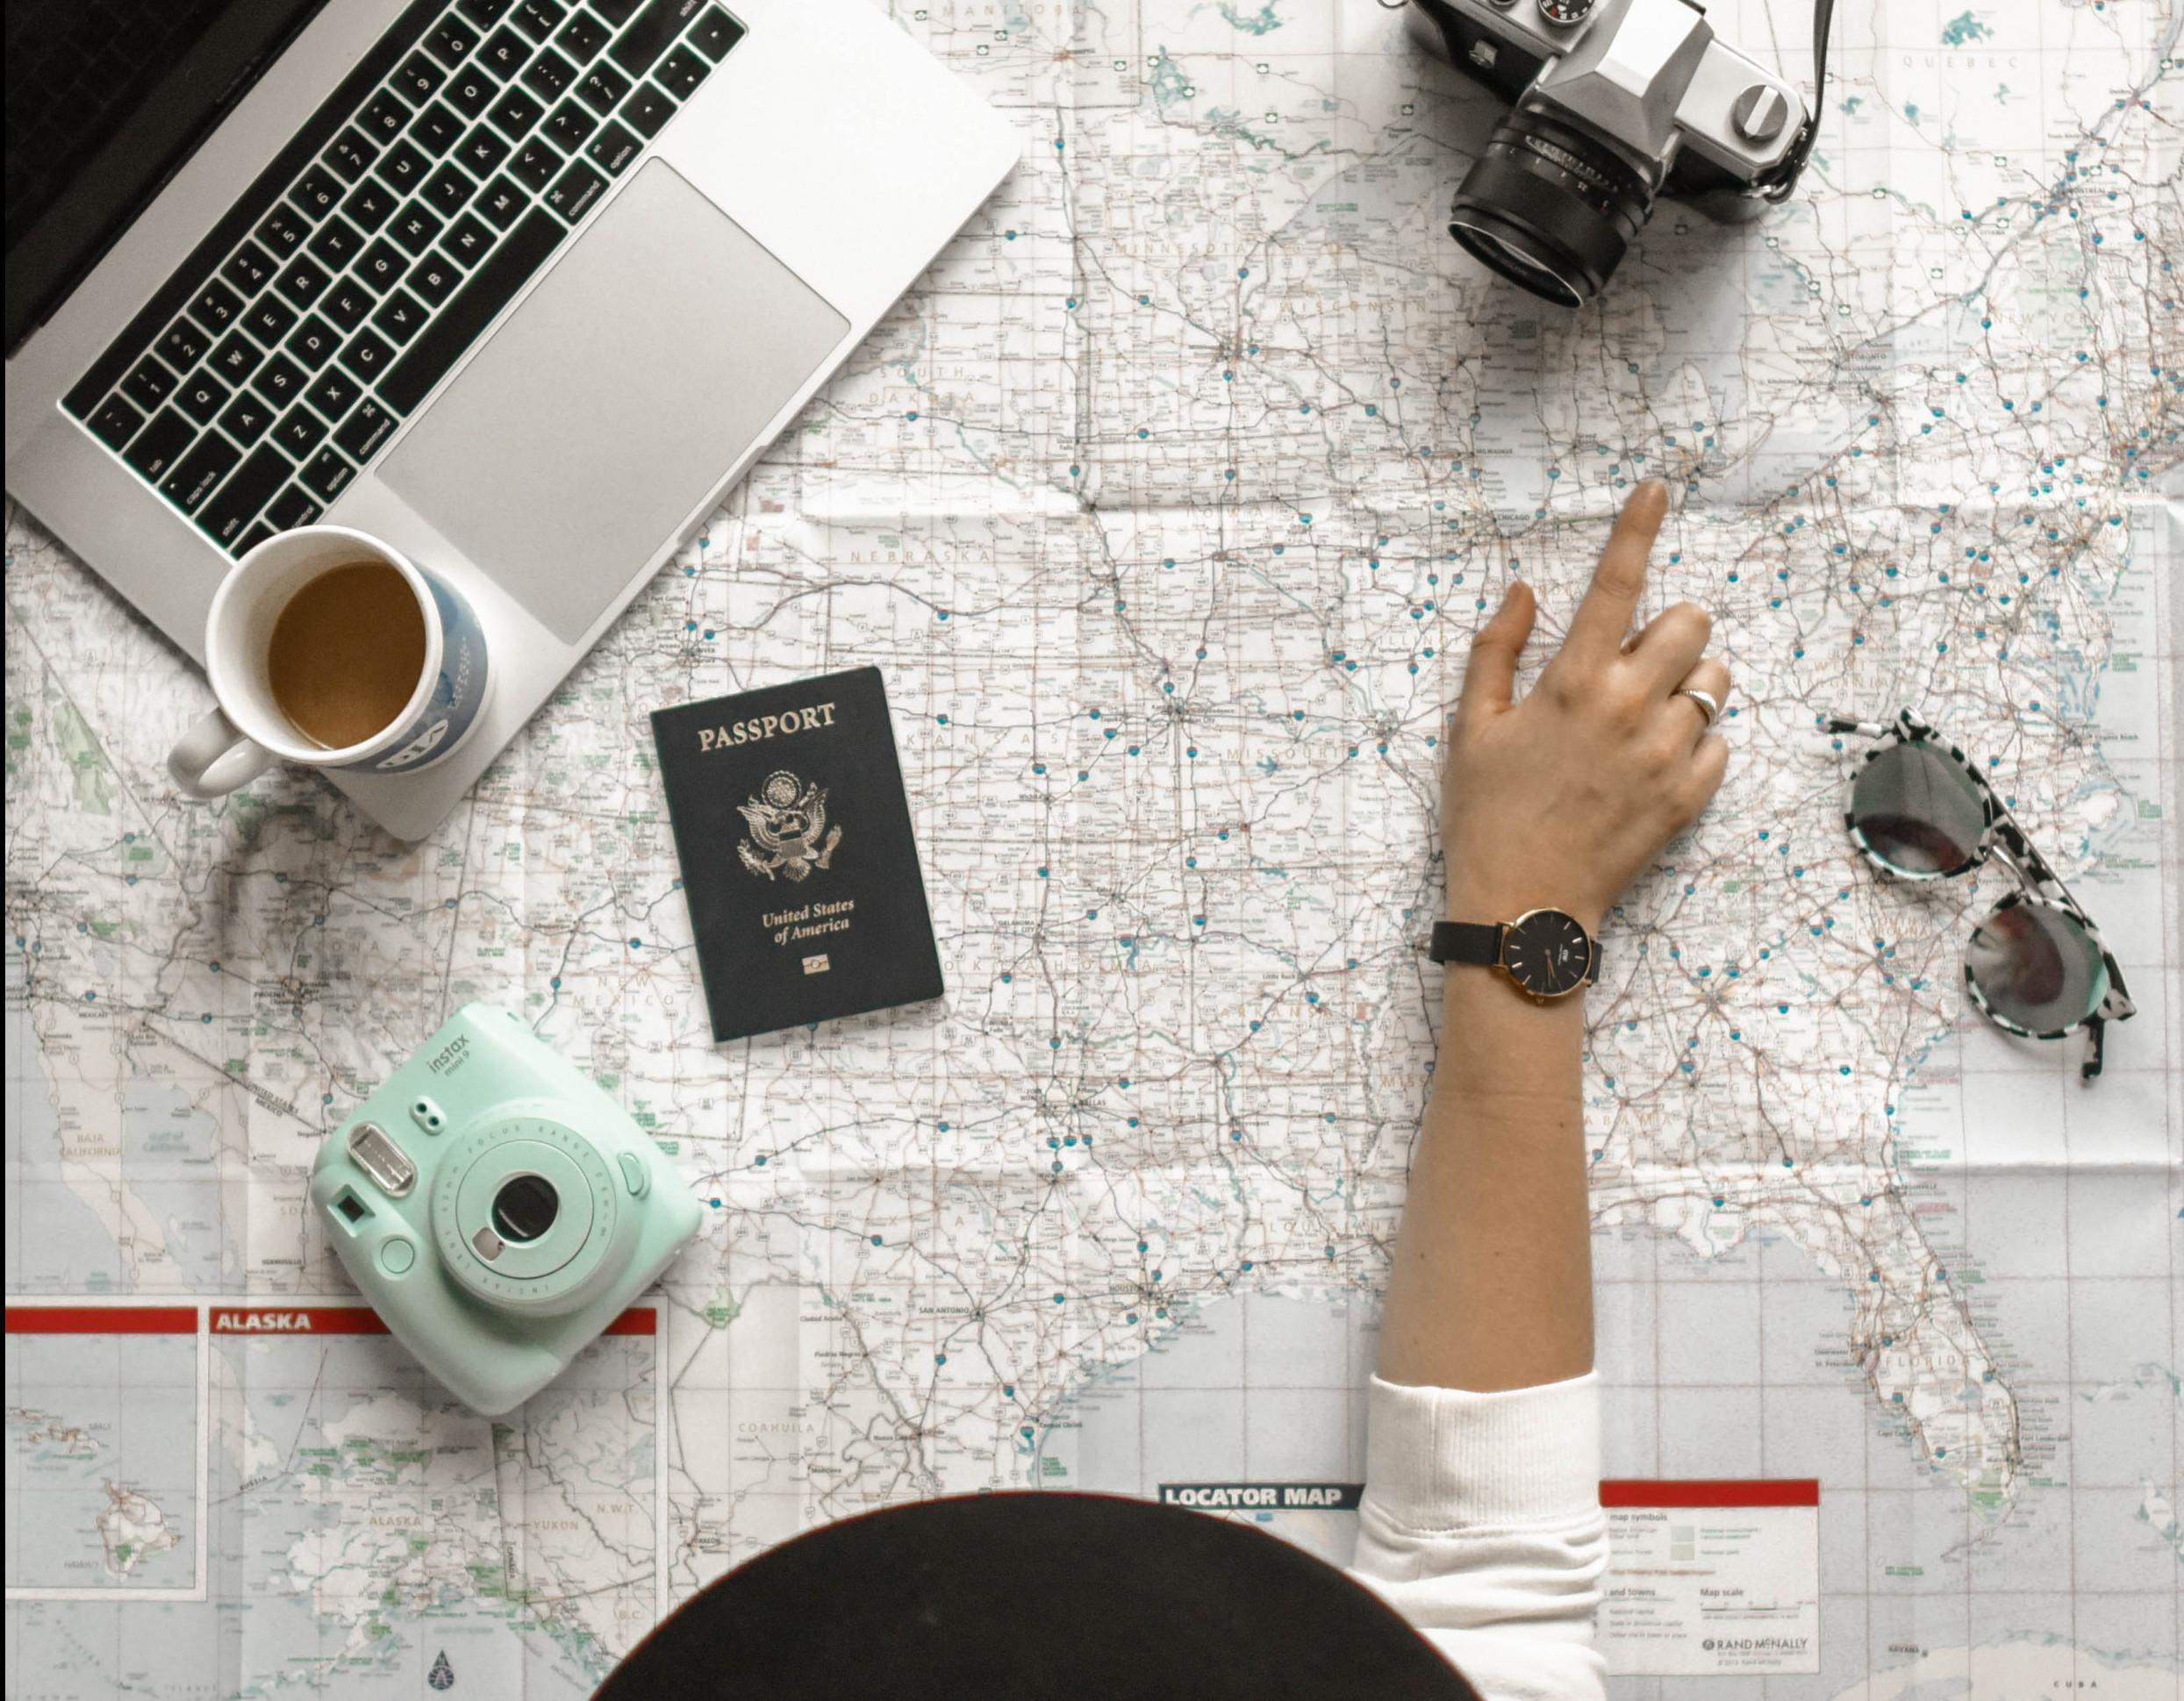 Eine Frau plant eine Reise ins Ausland